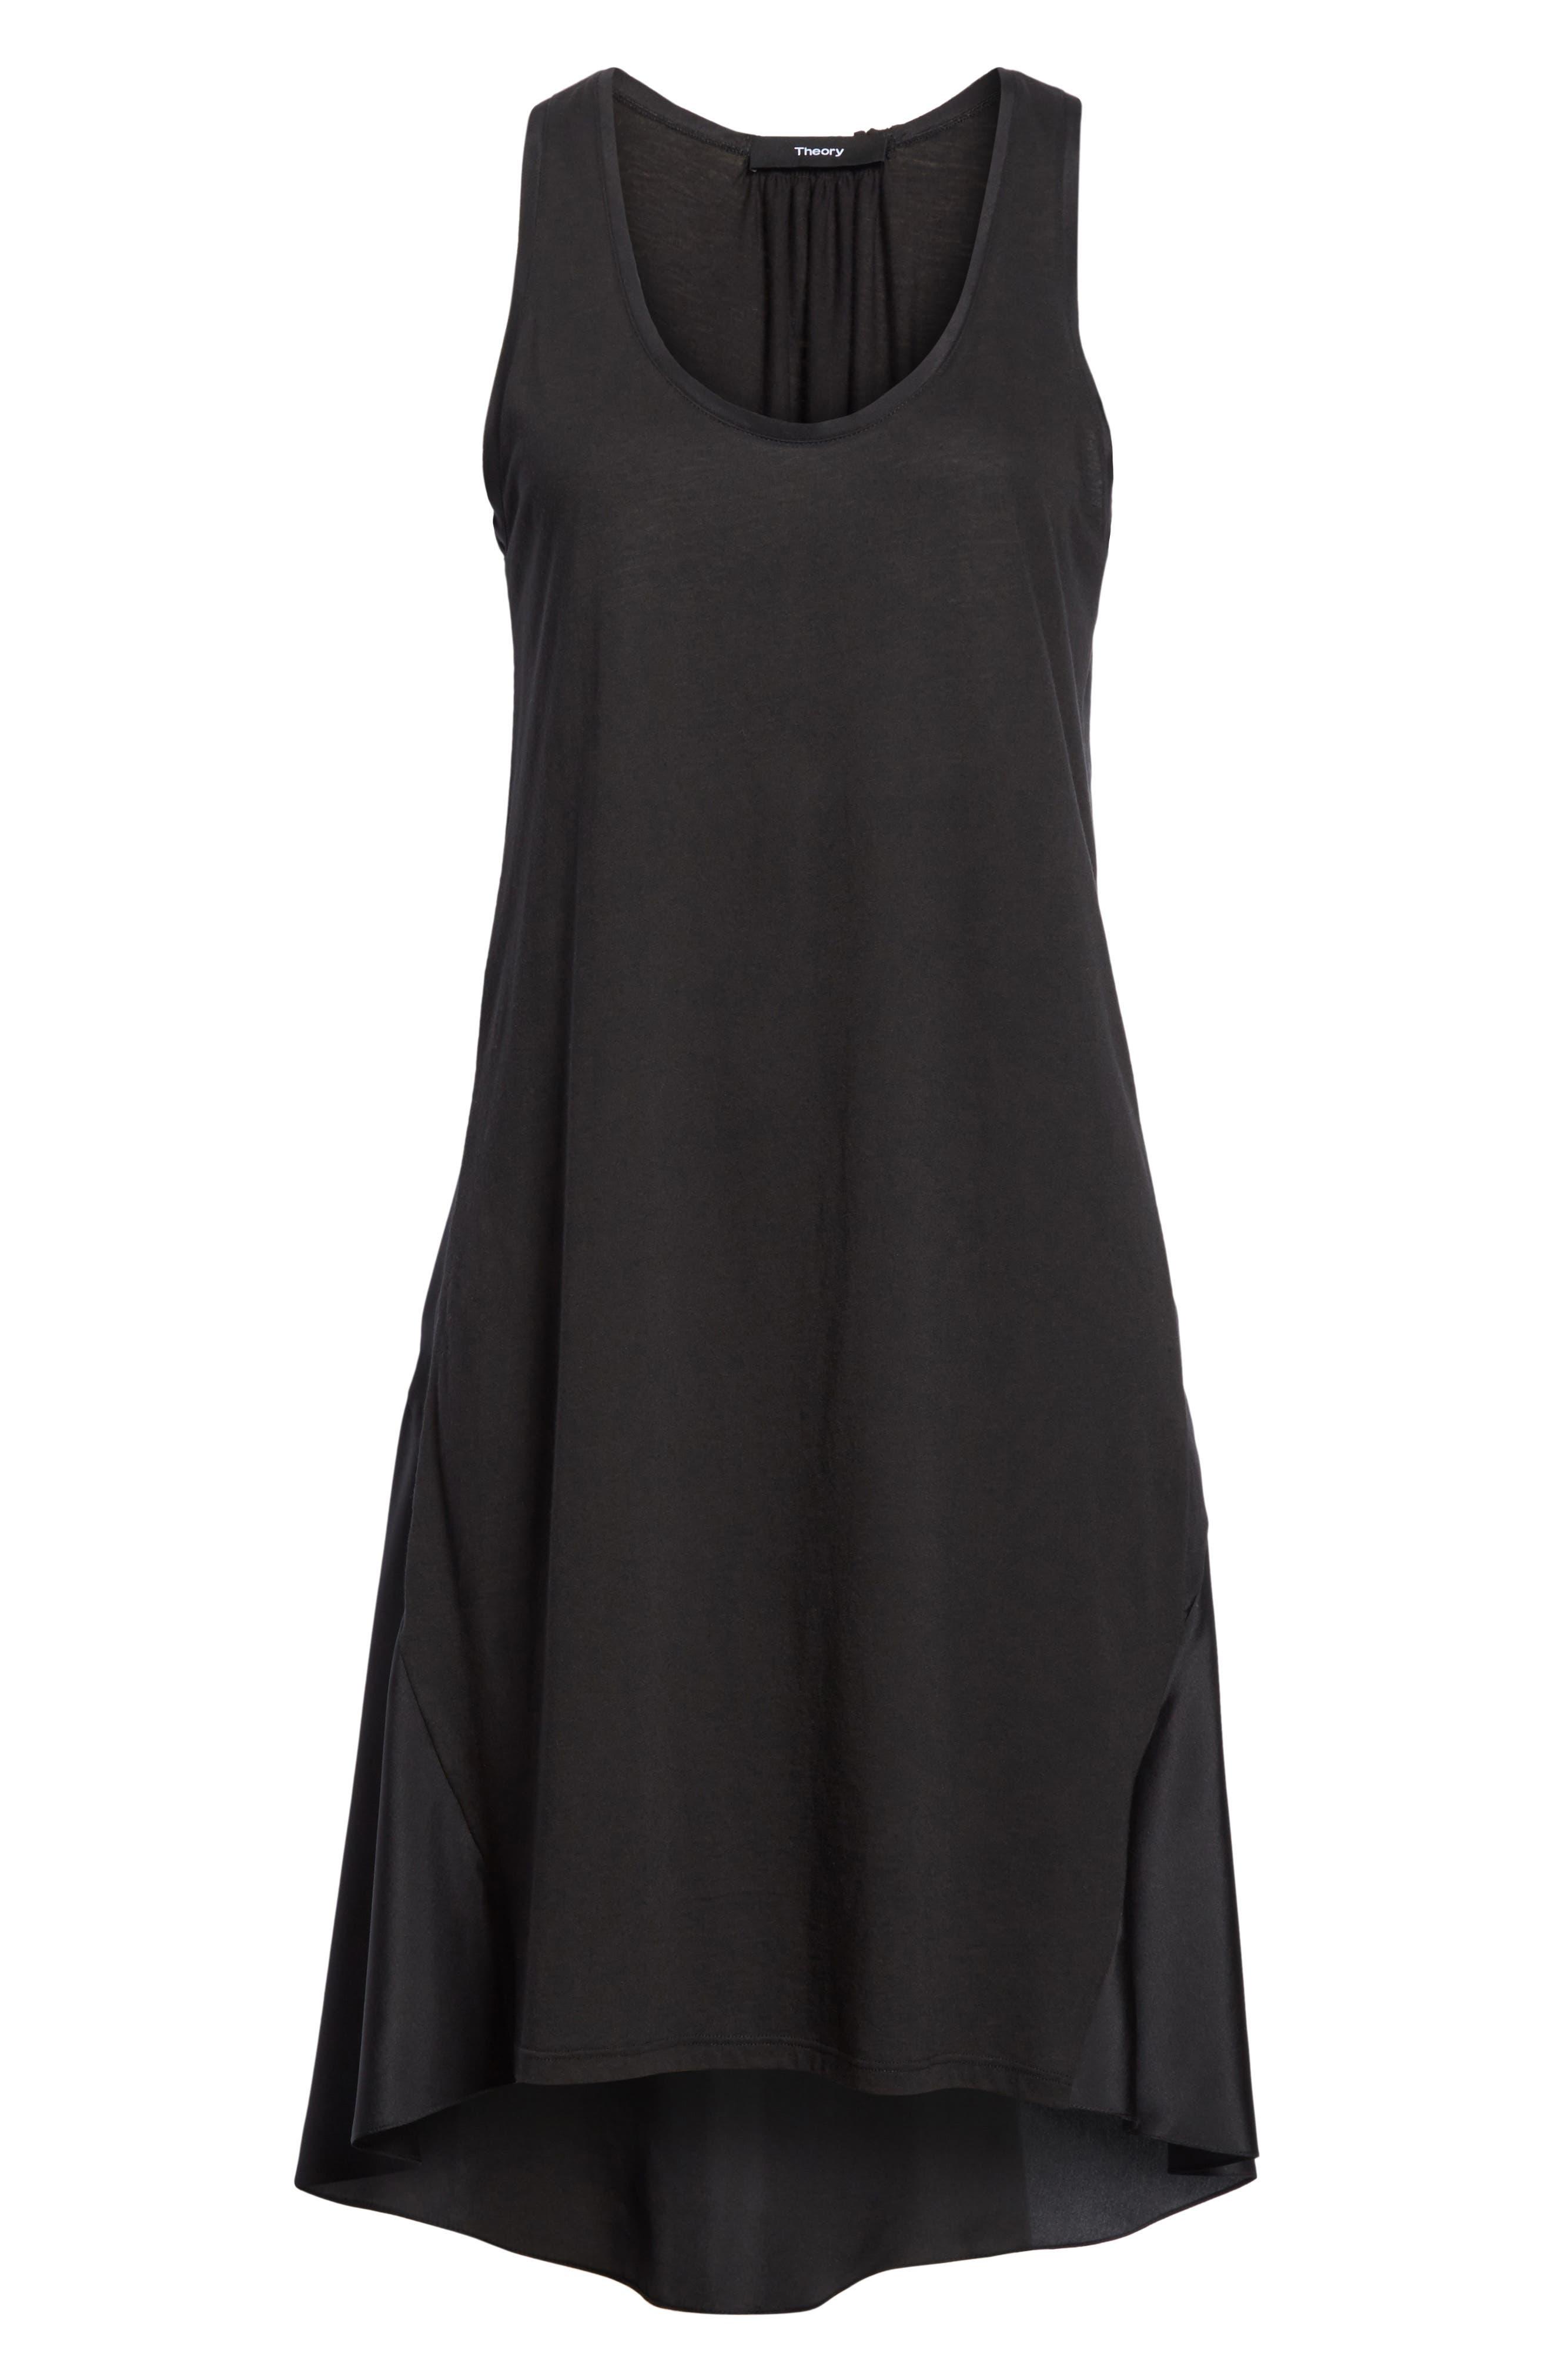 Plume Jersey Scoop Neck Swing Dress,                             Alternate thumbnail 6, color,                             001